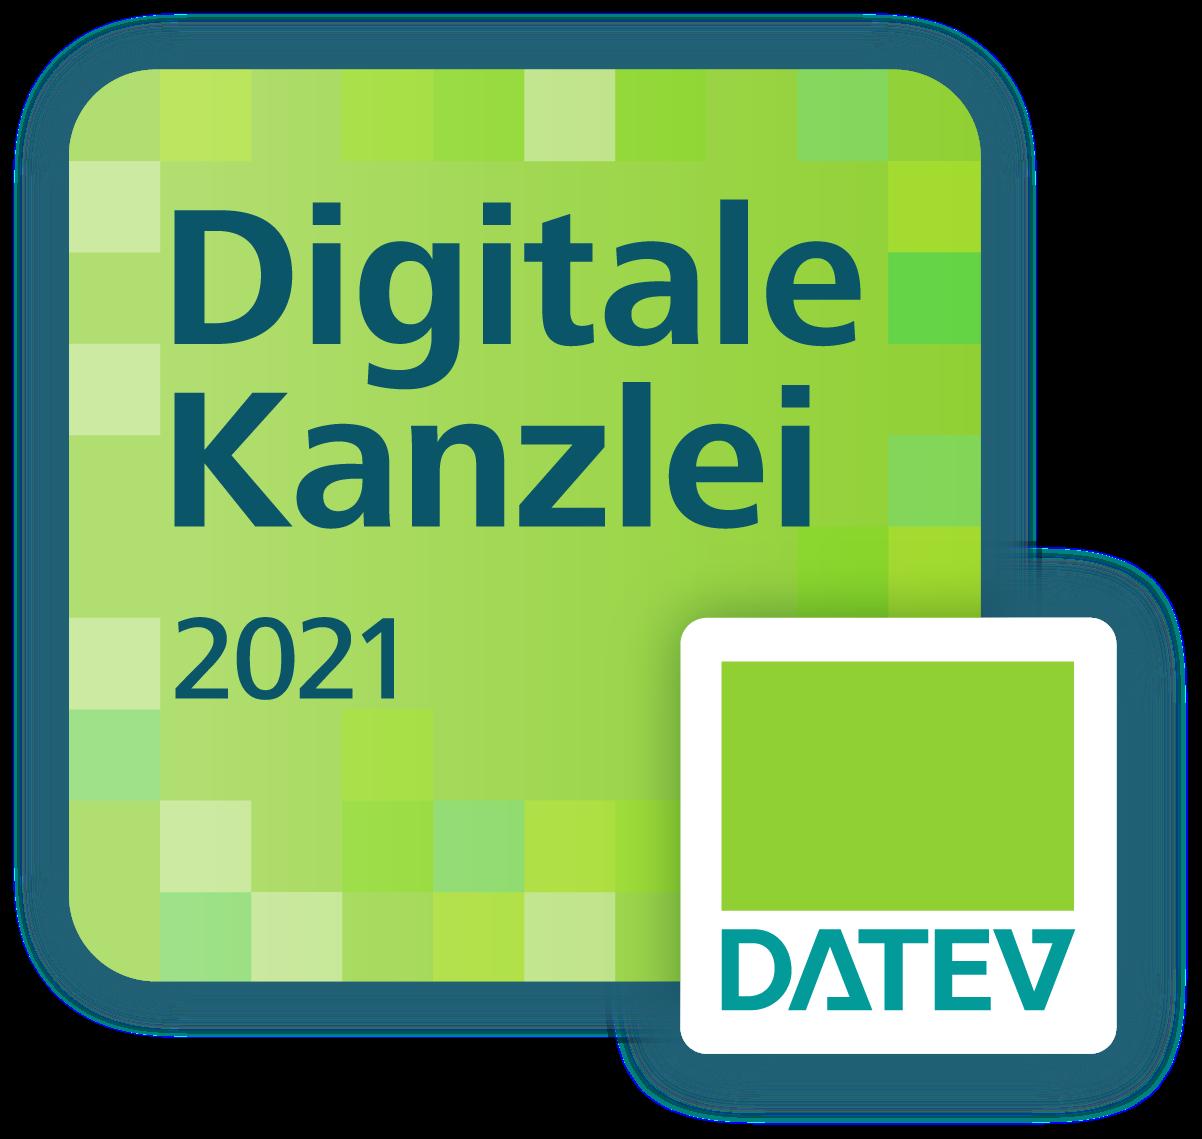 Kanzlei Gille ist digitale DATEV Kanzlei 2021